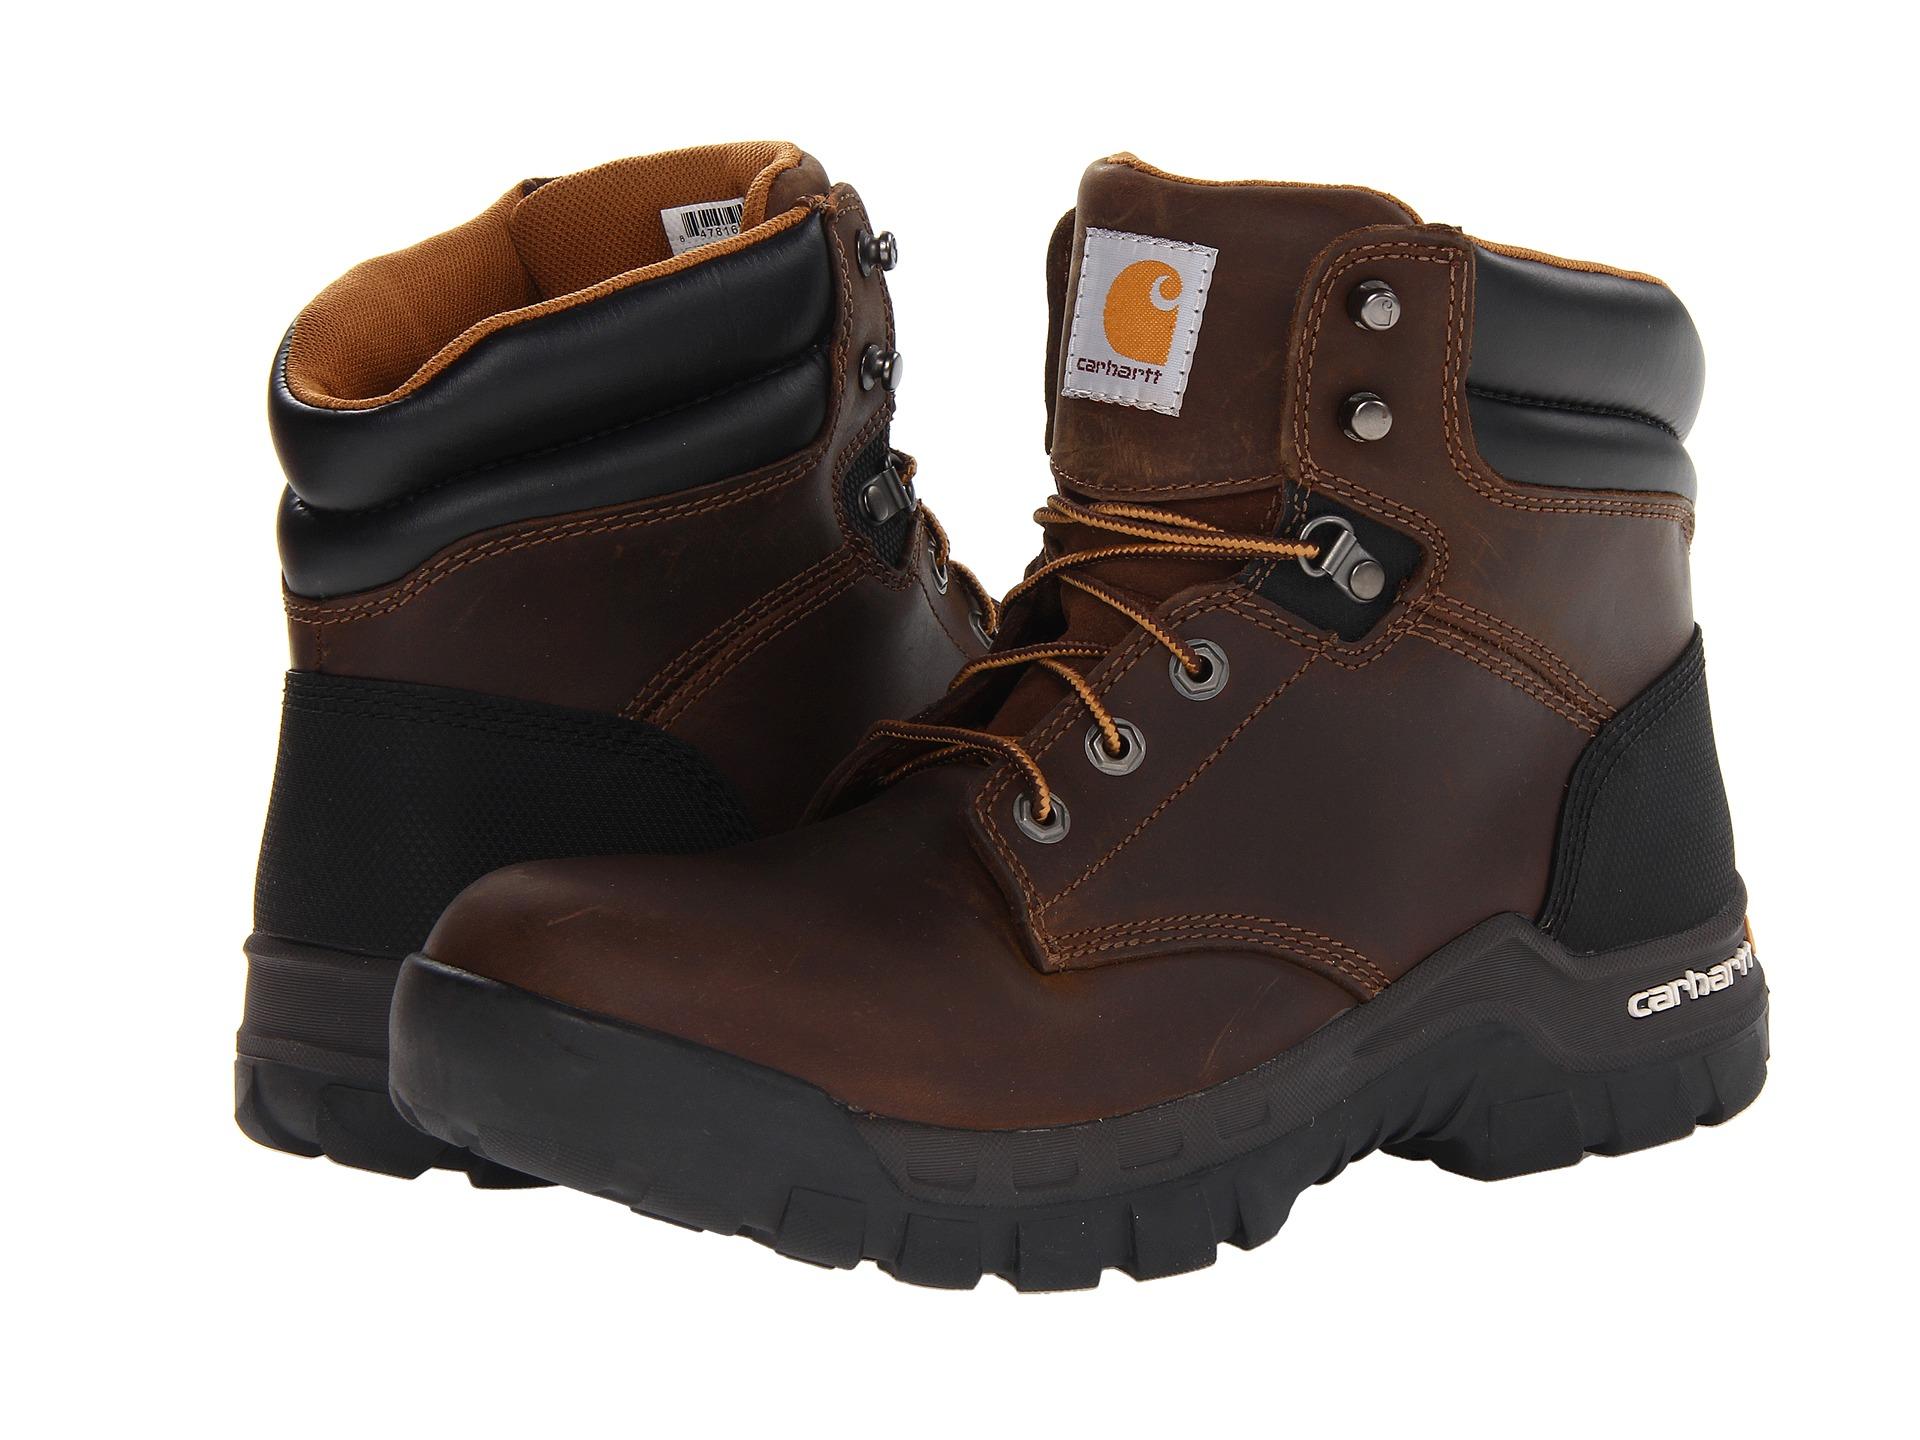 Carhartt 6-Inch Work-Flex™ Work Boot - Zappos.com Free Shipping ...